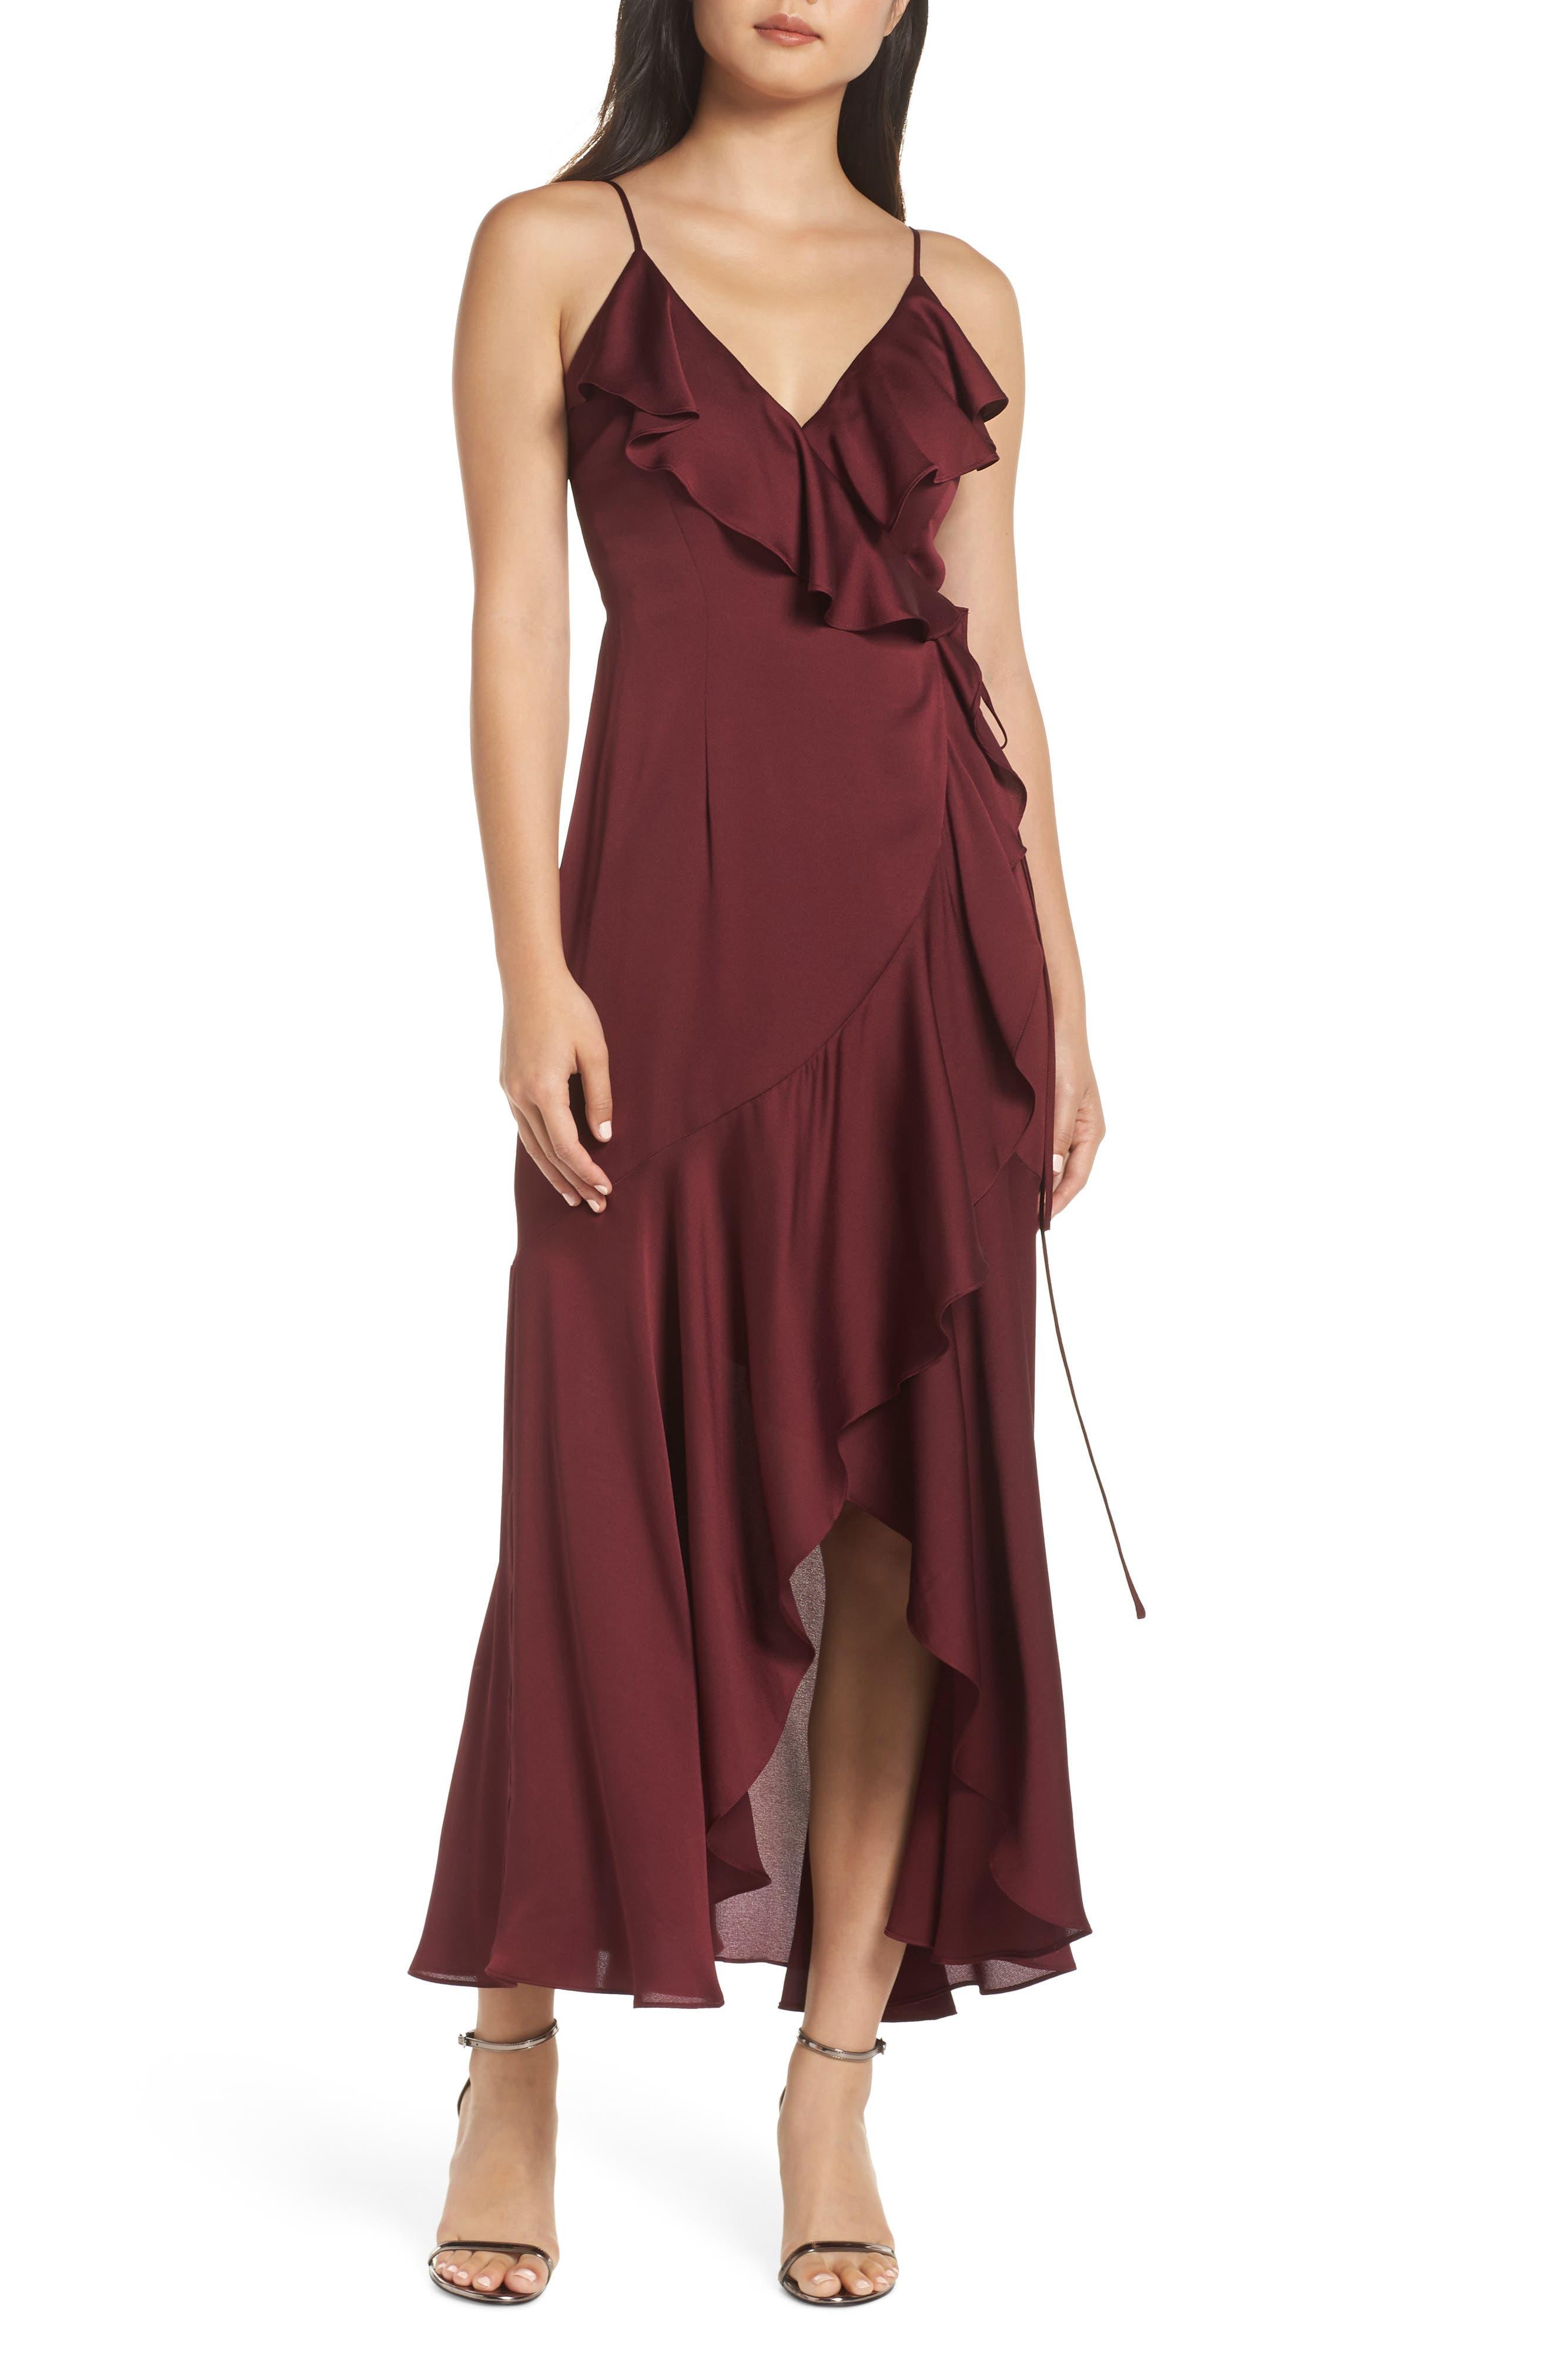 SHONA JOY Luxe Ruffle Trim Wrap Gown in Garnet